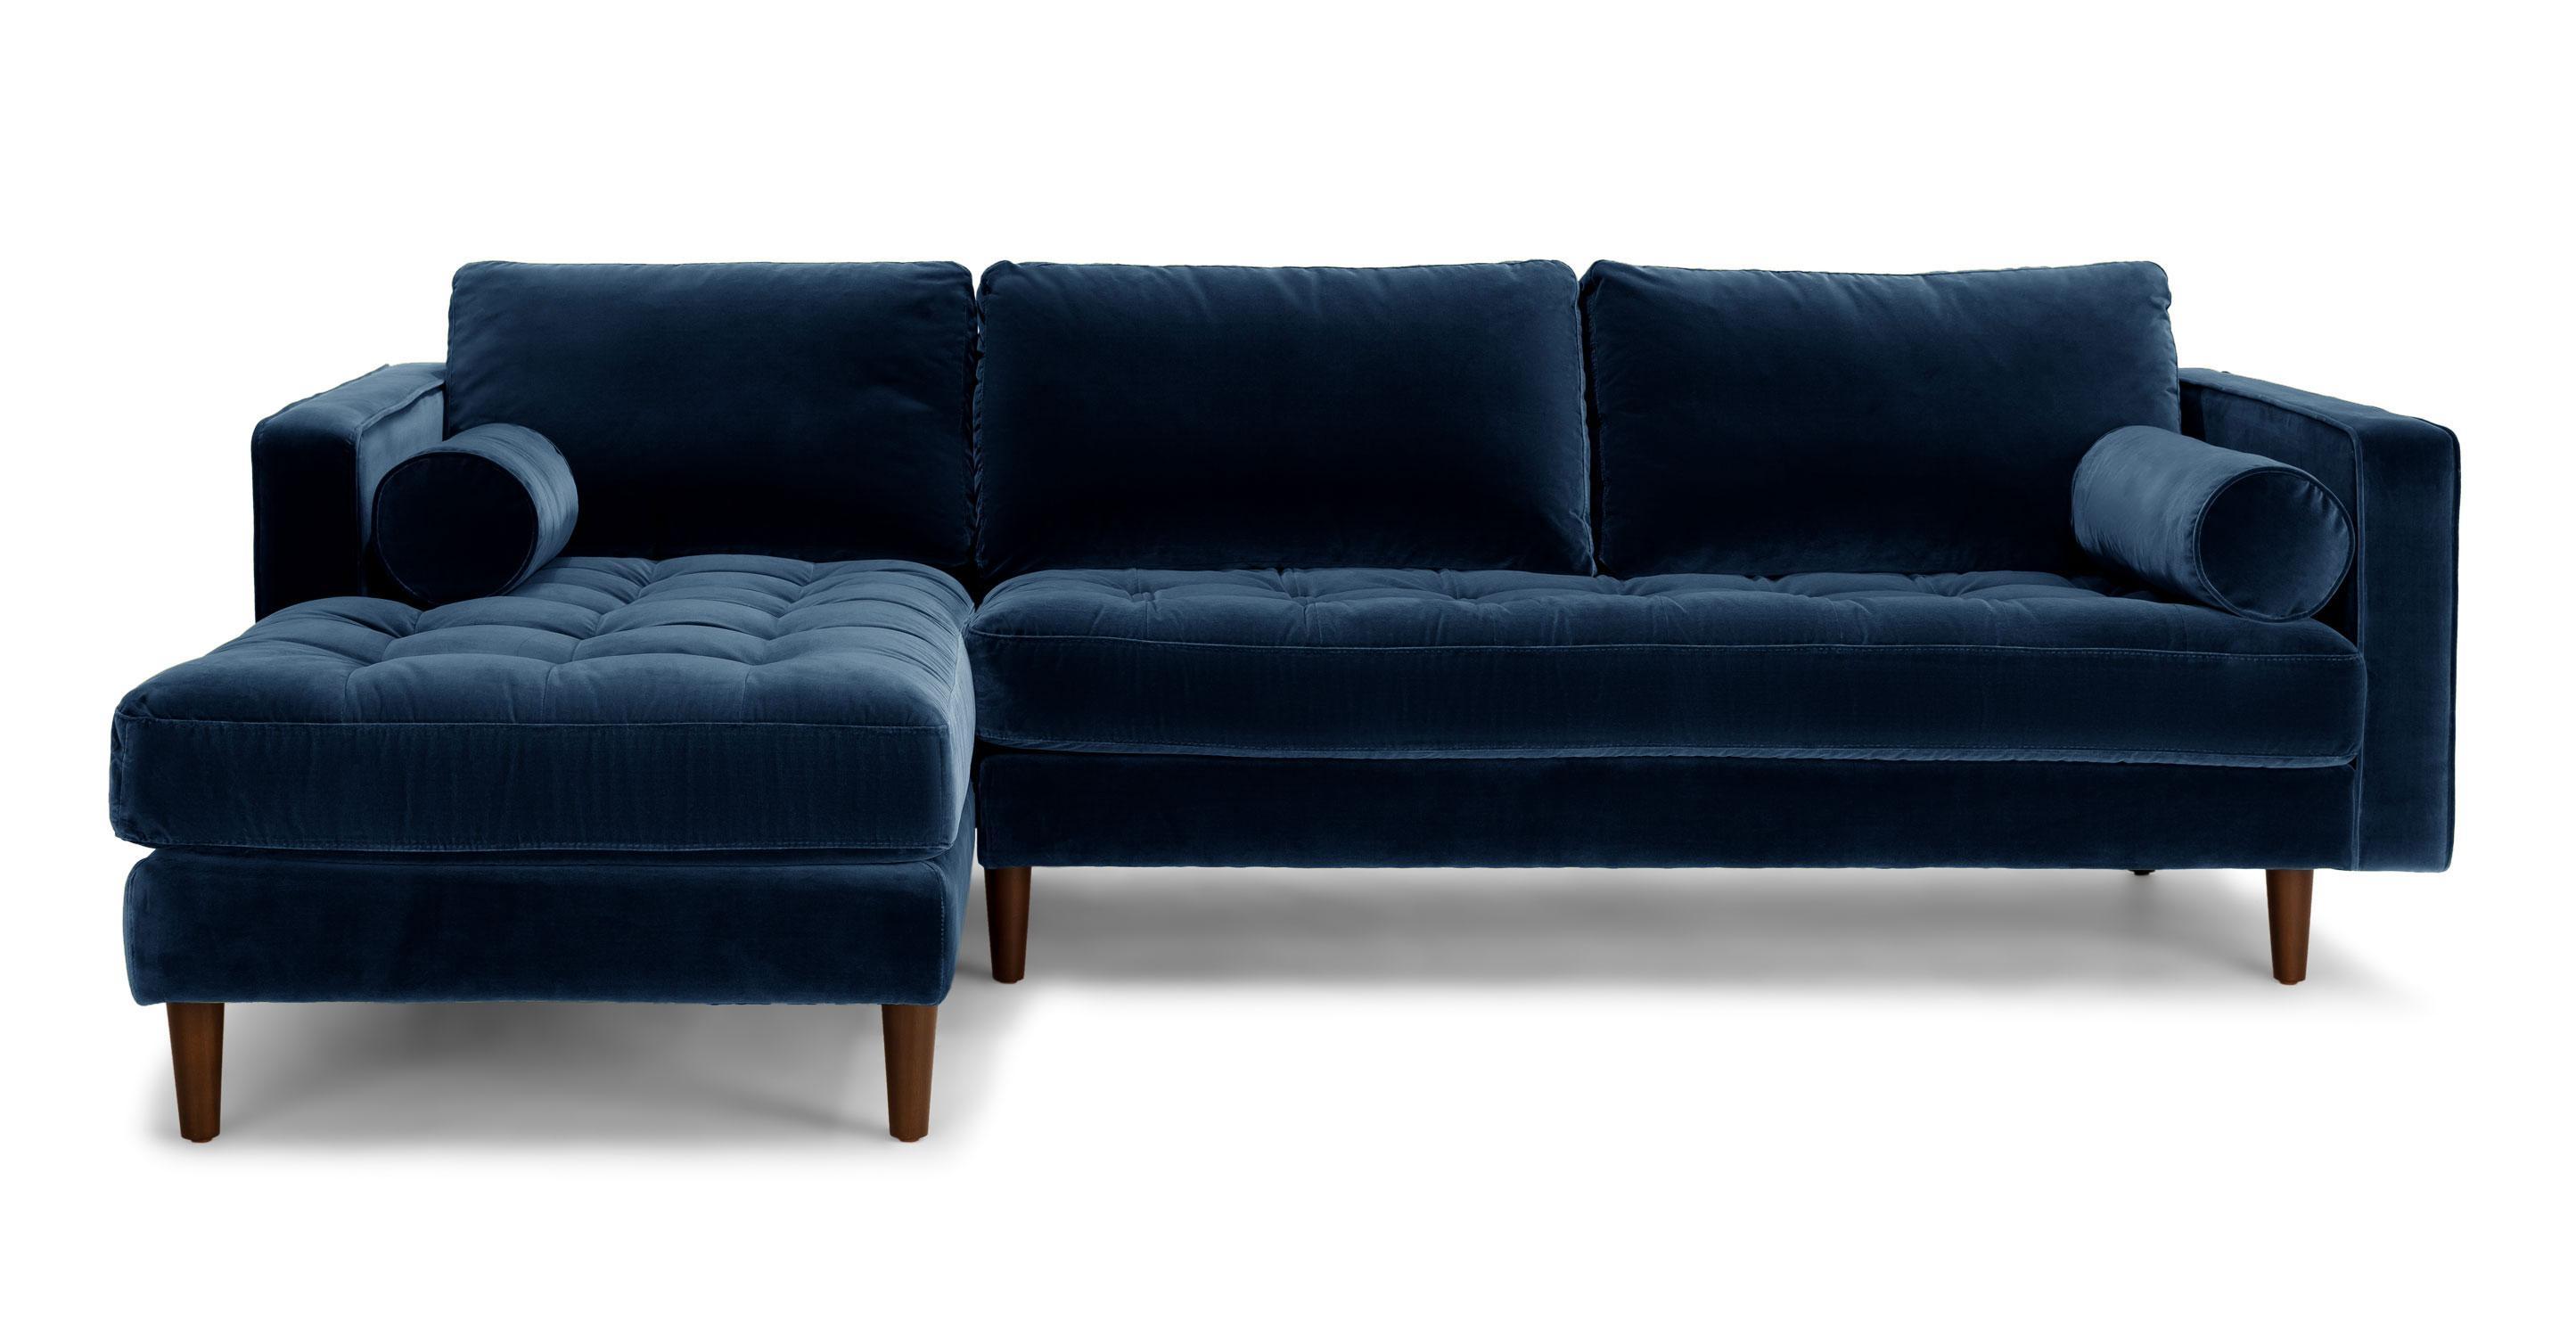 Blue Velvet Sectional Sofa | Tehranmix Decoration With Velvet Sofas Sectionals (Photo 14 of 20)